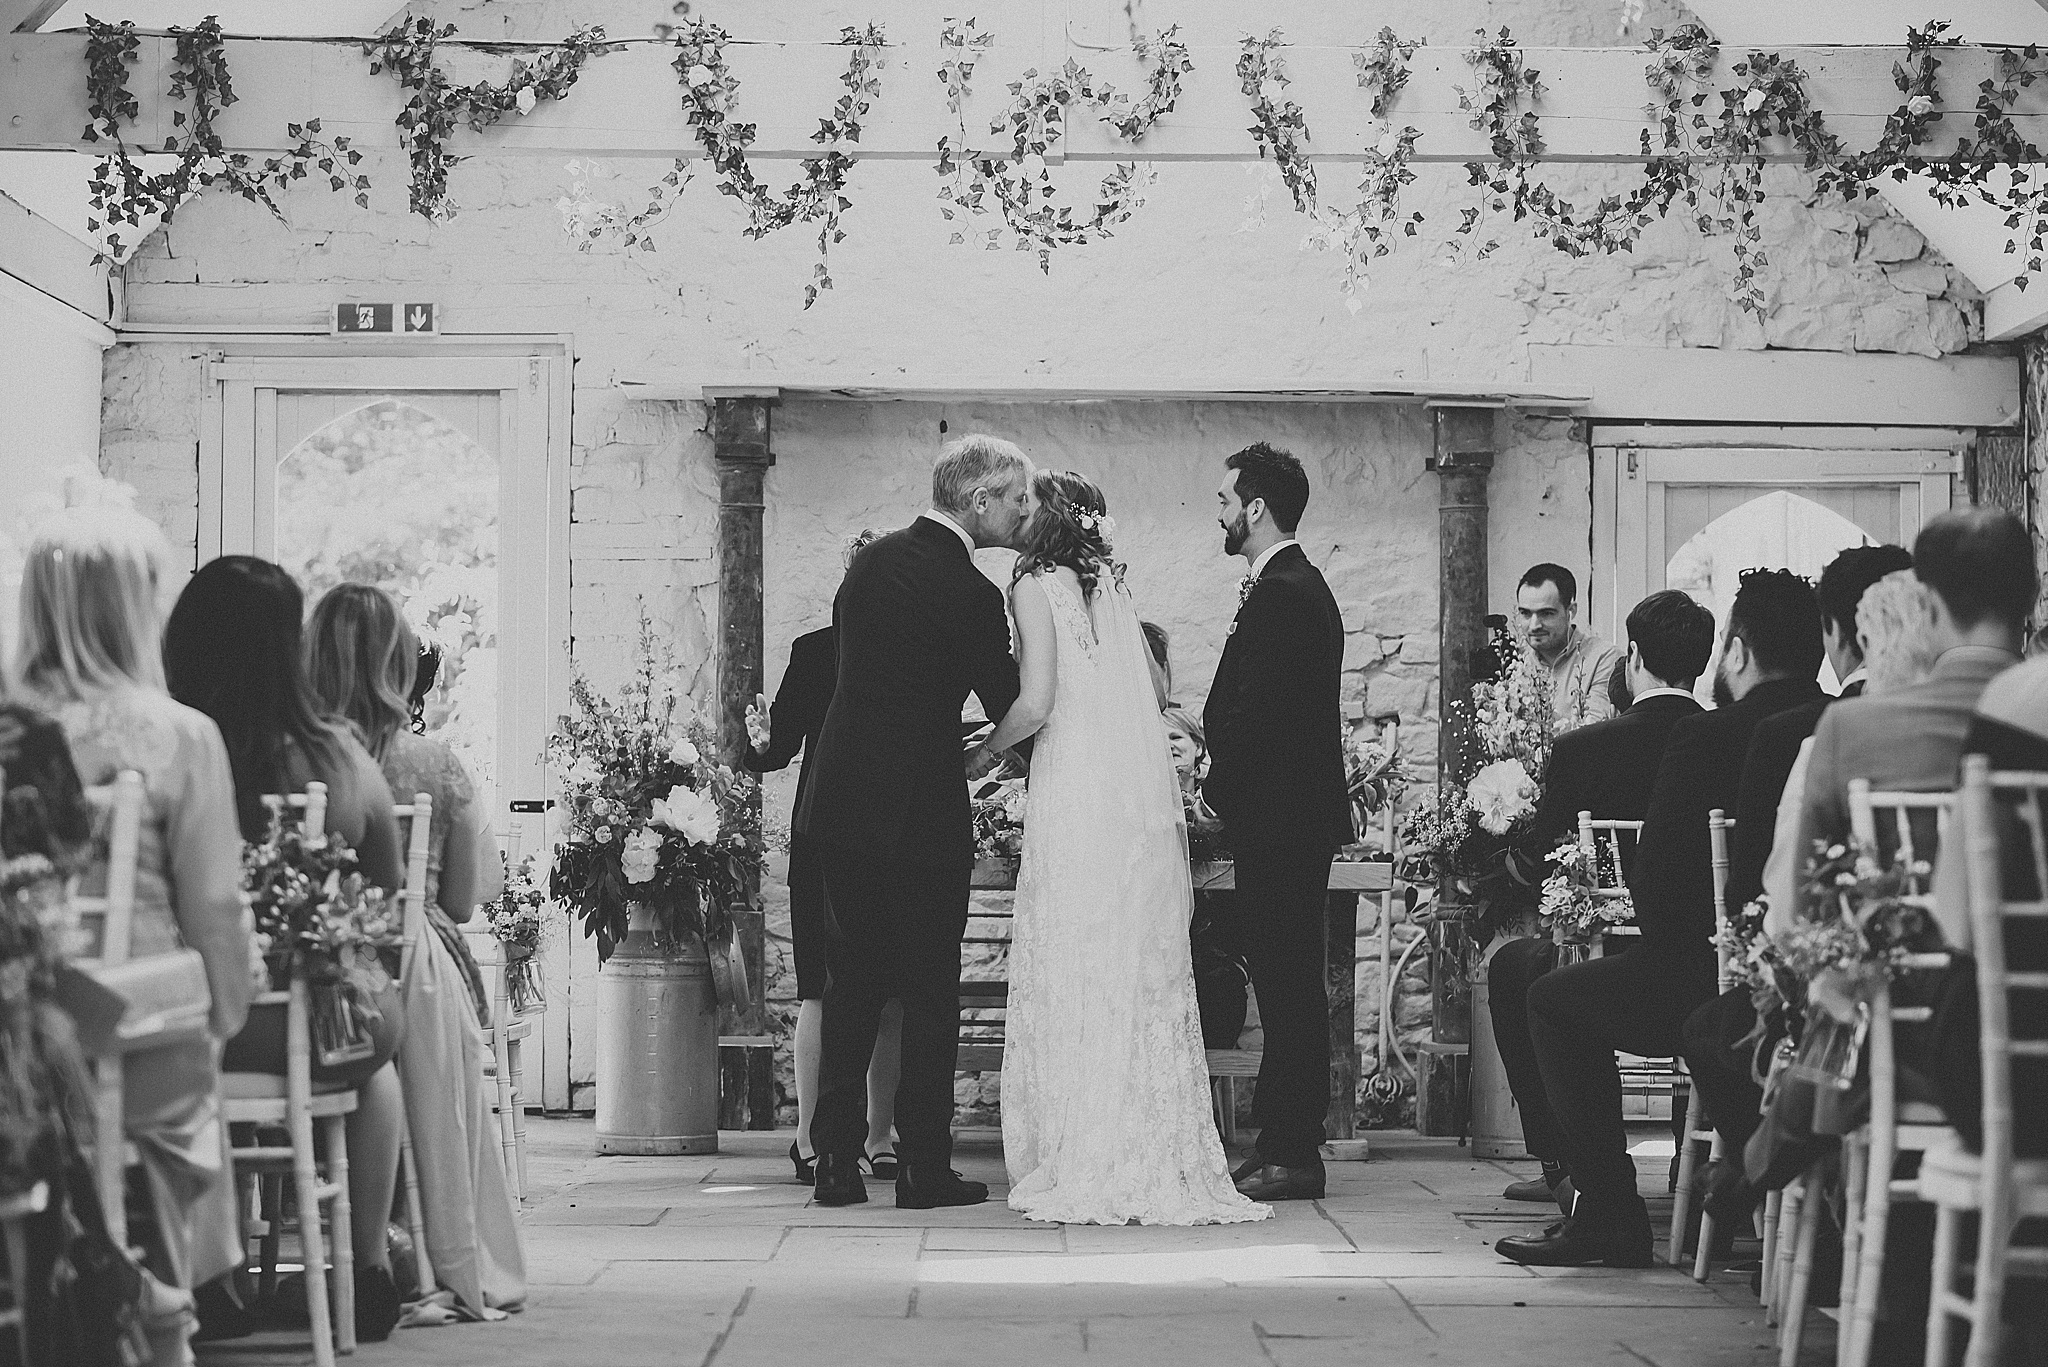 festival wedding at wyresdale park, scorton